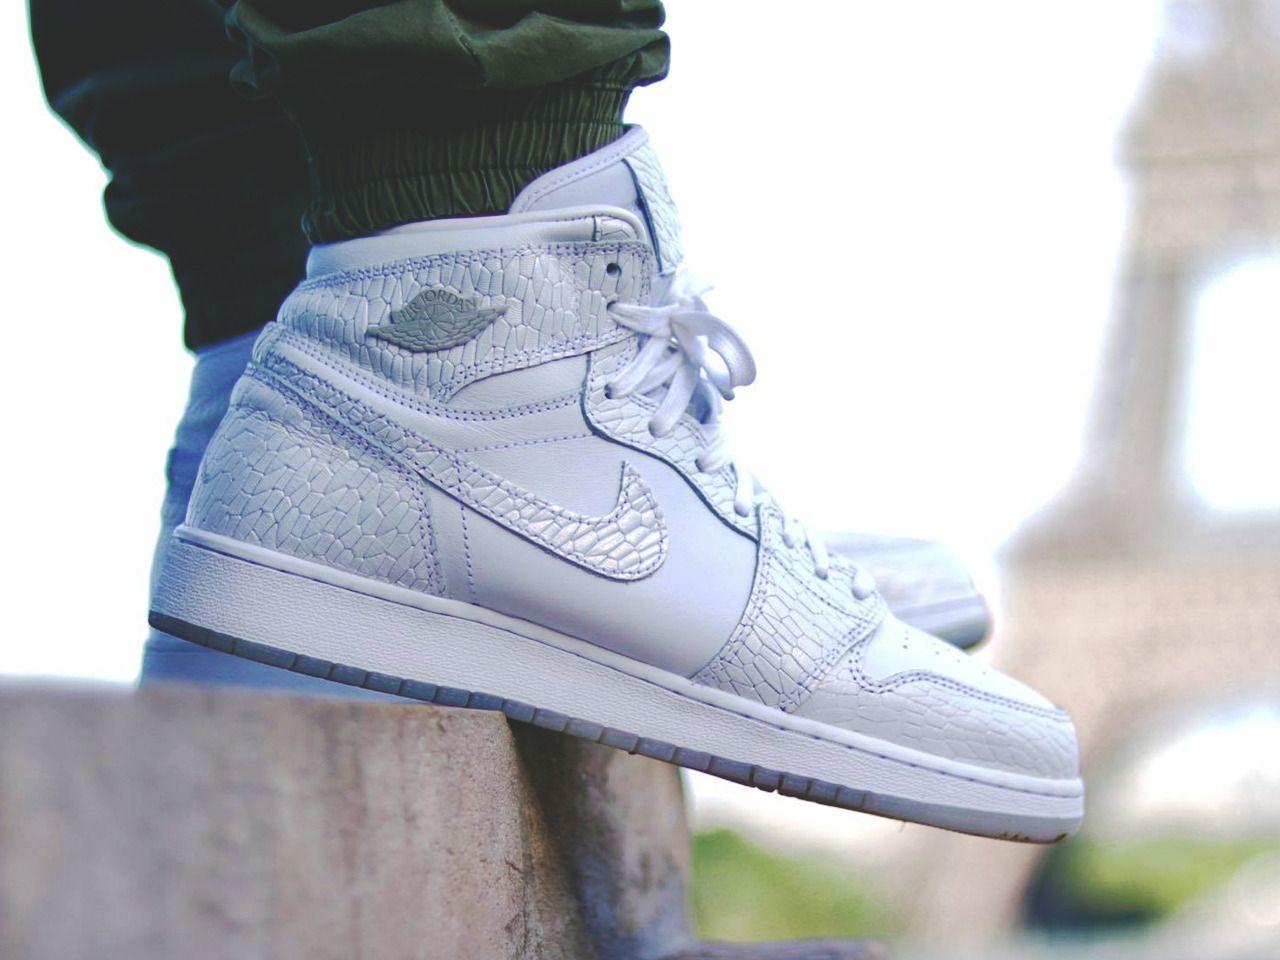 Nike Air Jordan 1 Retro High GS Frost White 2017 (by